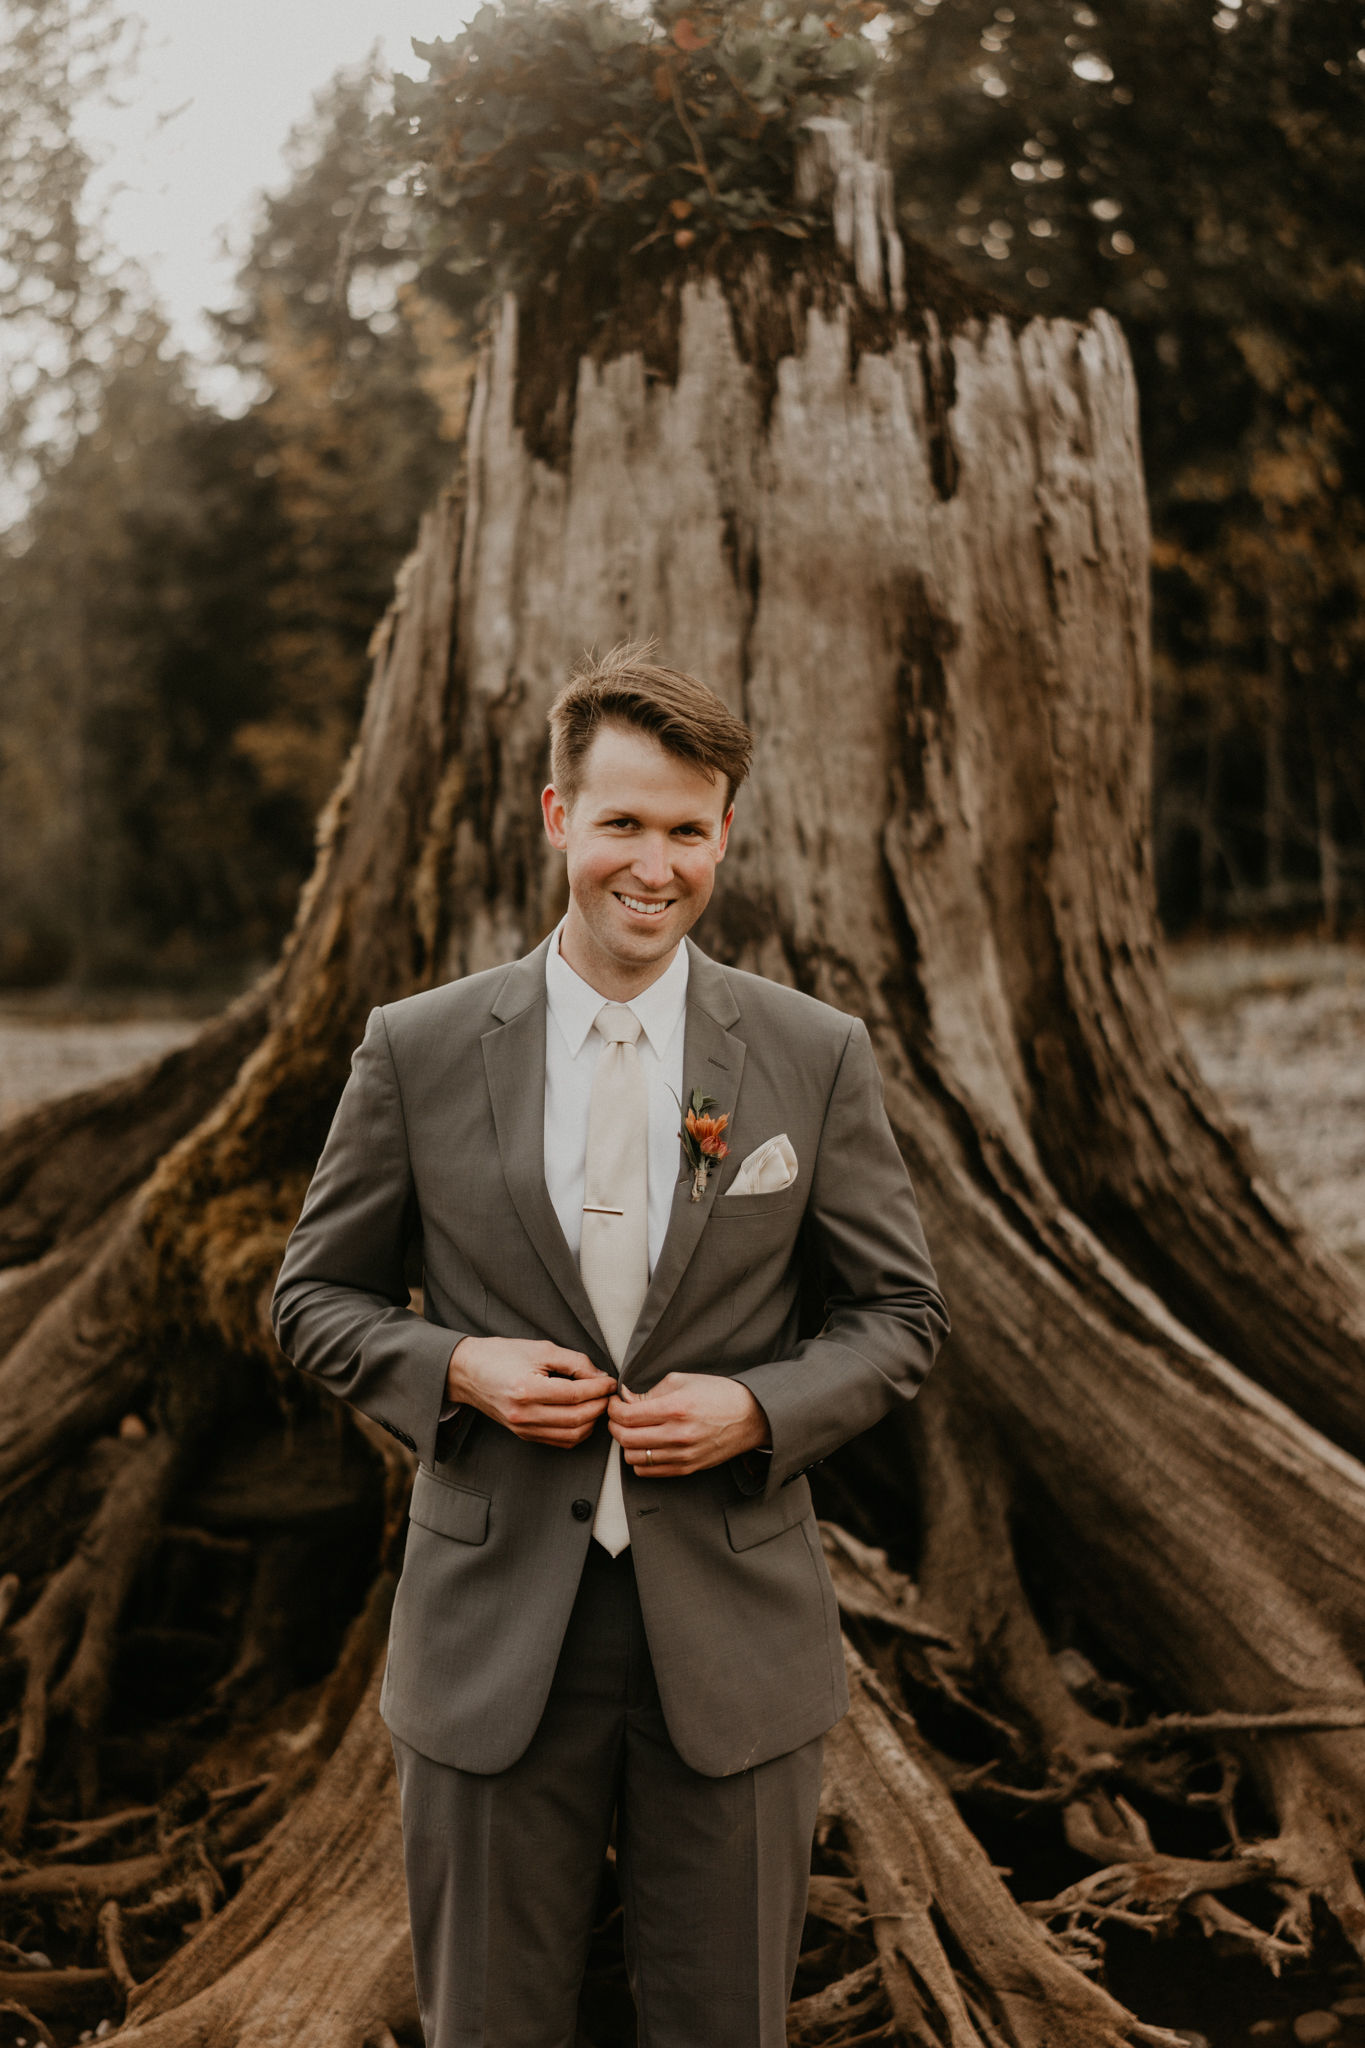 Lake-Cushman-Wedding-Elopement-Engagement-Seattle-Washington-PNW-Adventure-Nature-Photographer-19.jpg